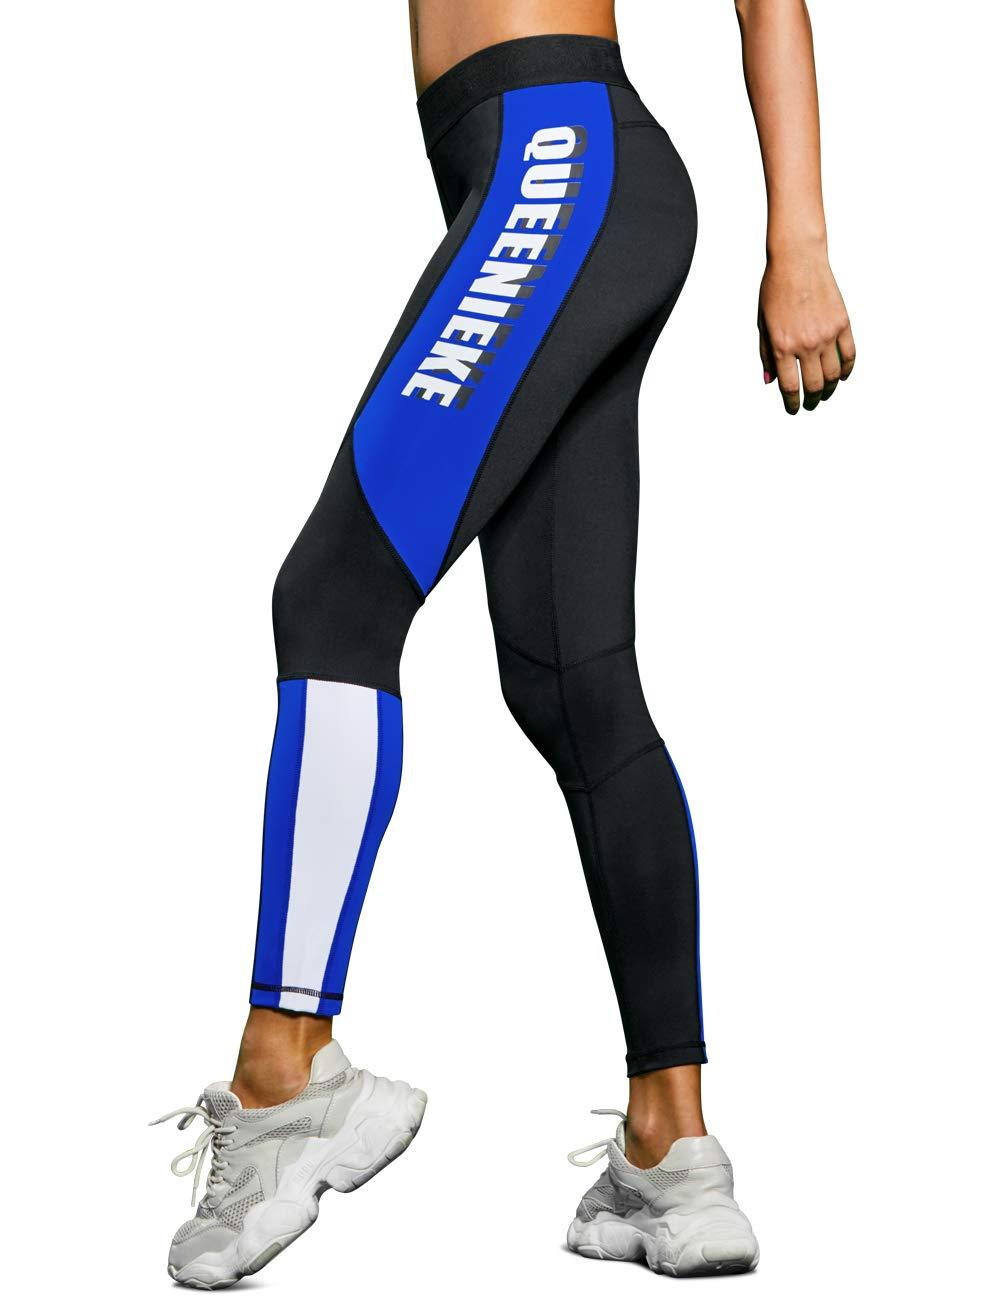 QUEENIEKE Women Workout Leggings High Waisted Buttery Soft Yoga Pants Running Tights (90307)